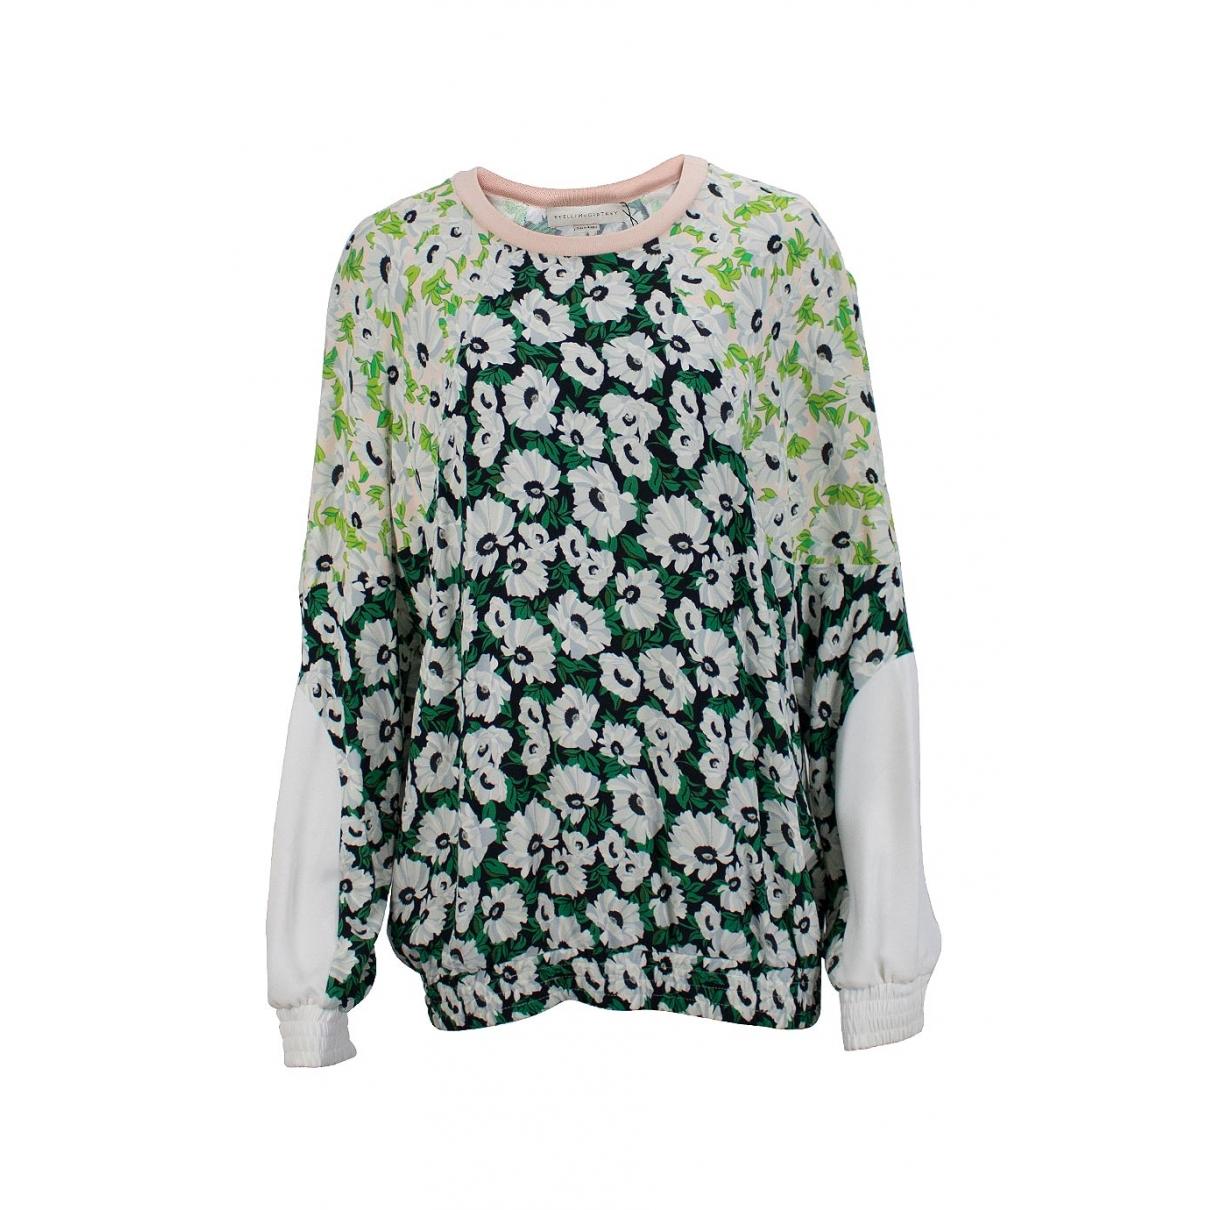 Stella Mccartney \N Pullover in  Gruen Baumwolle